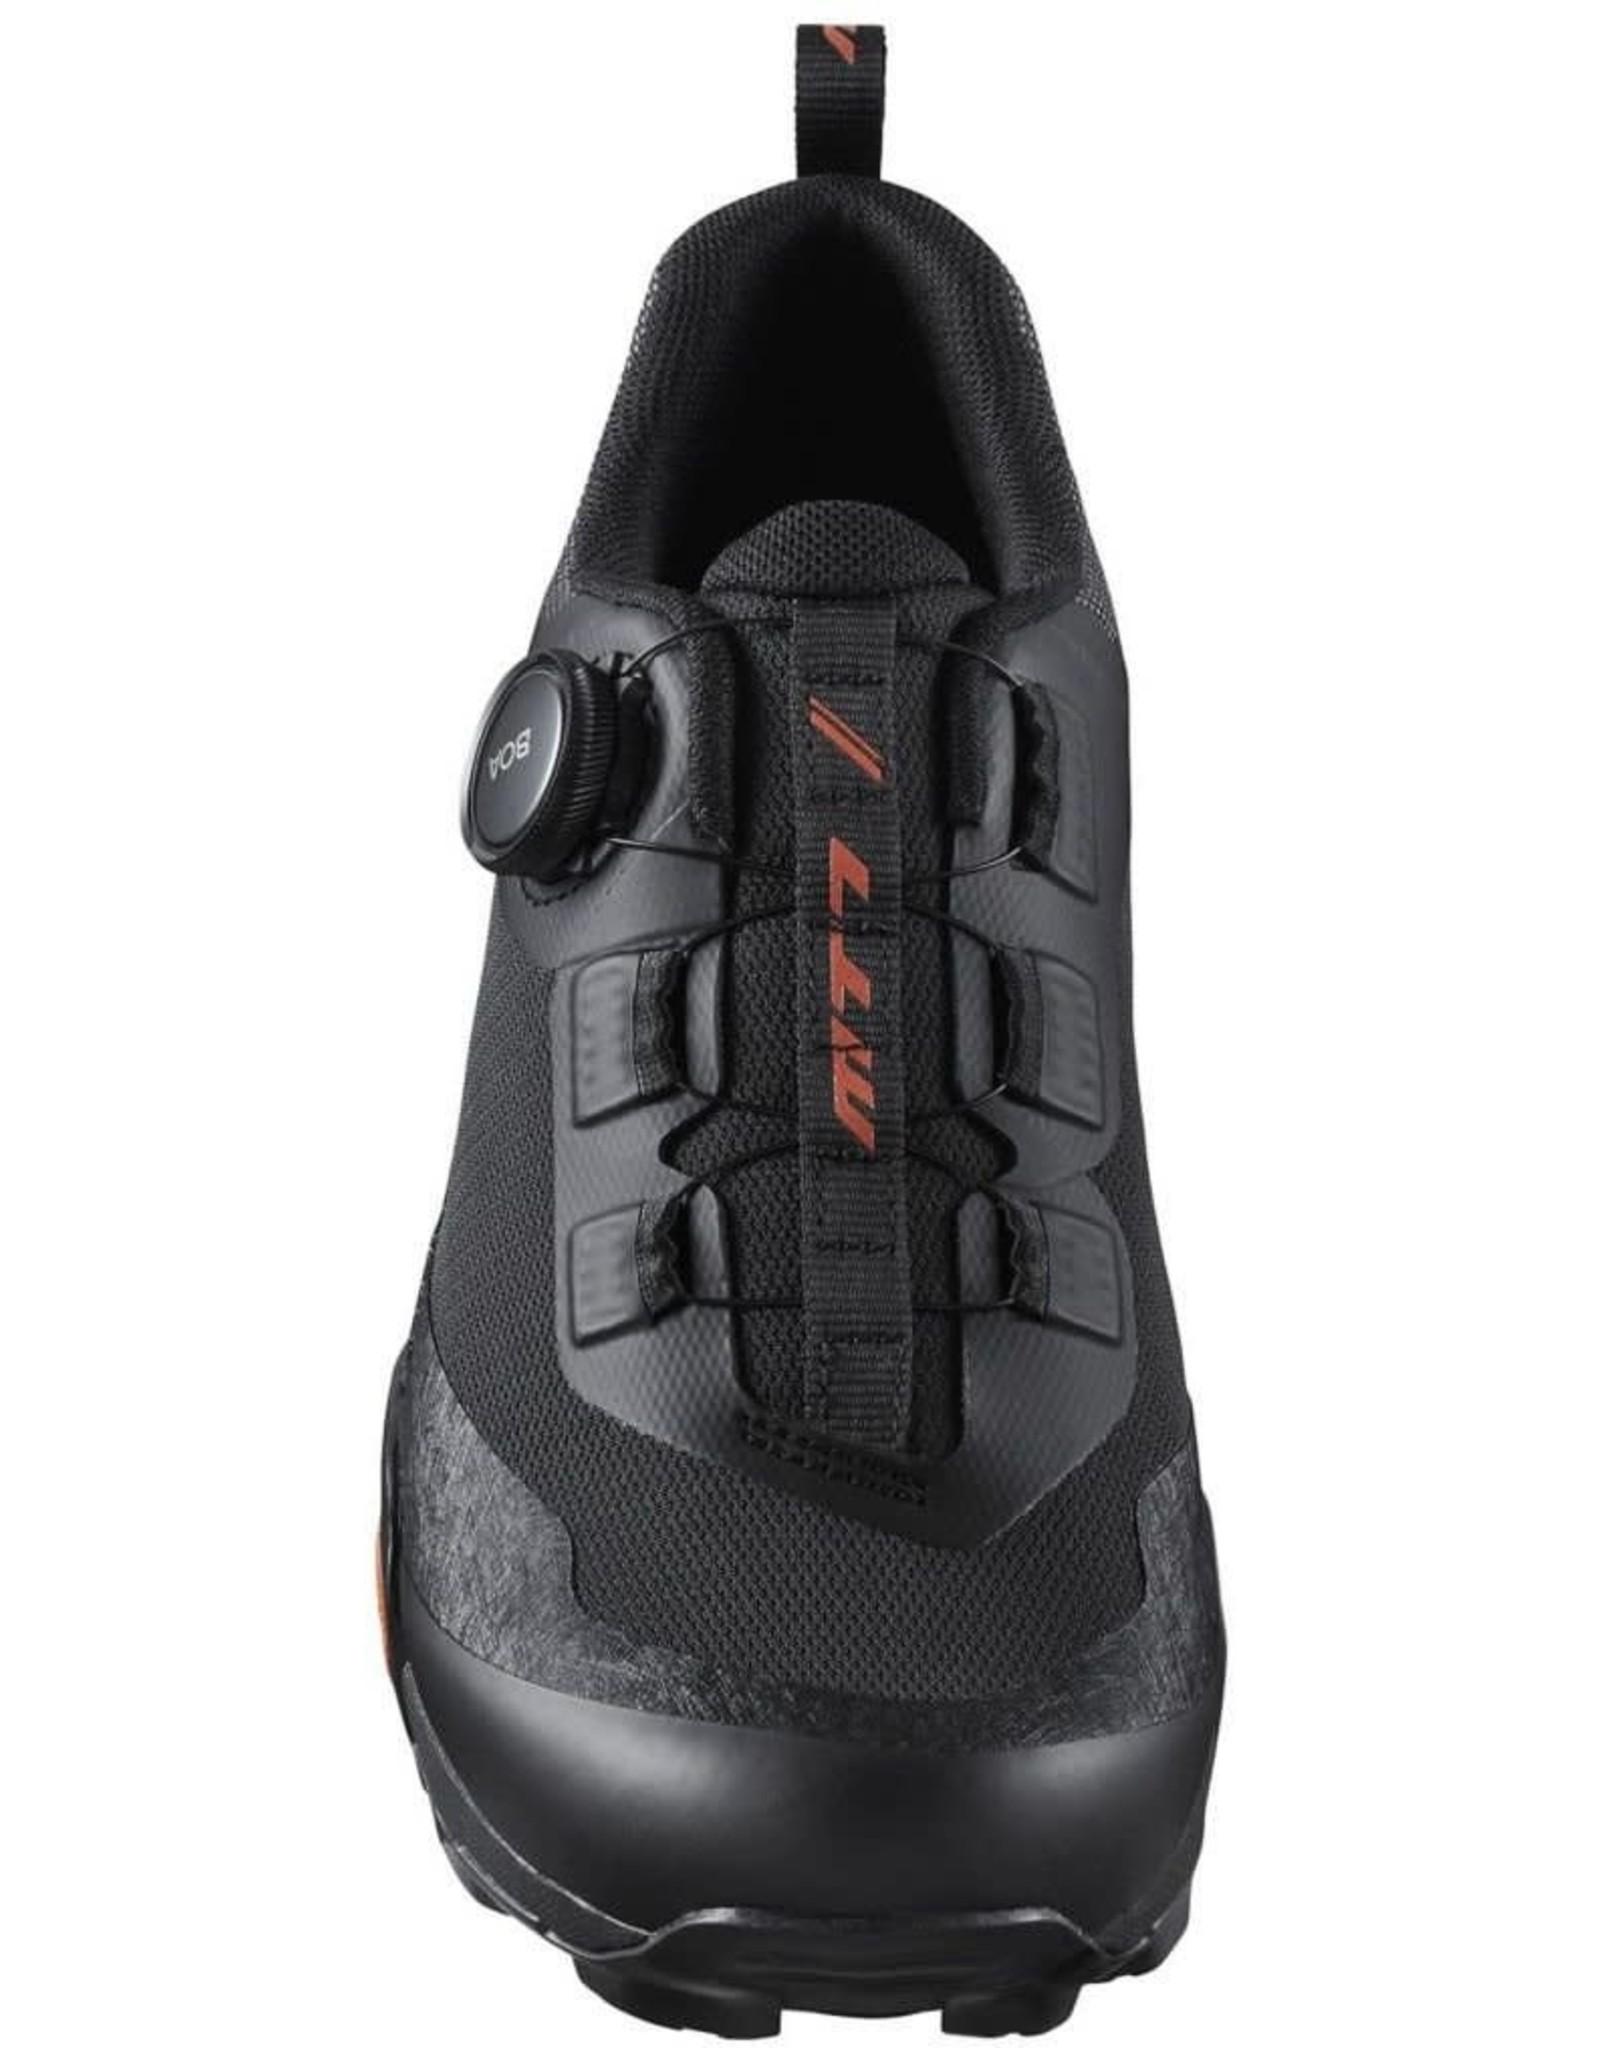 SHIMANO SH-MT701 CYCLING SHOES BLACK